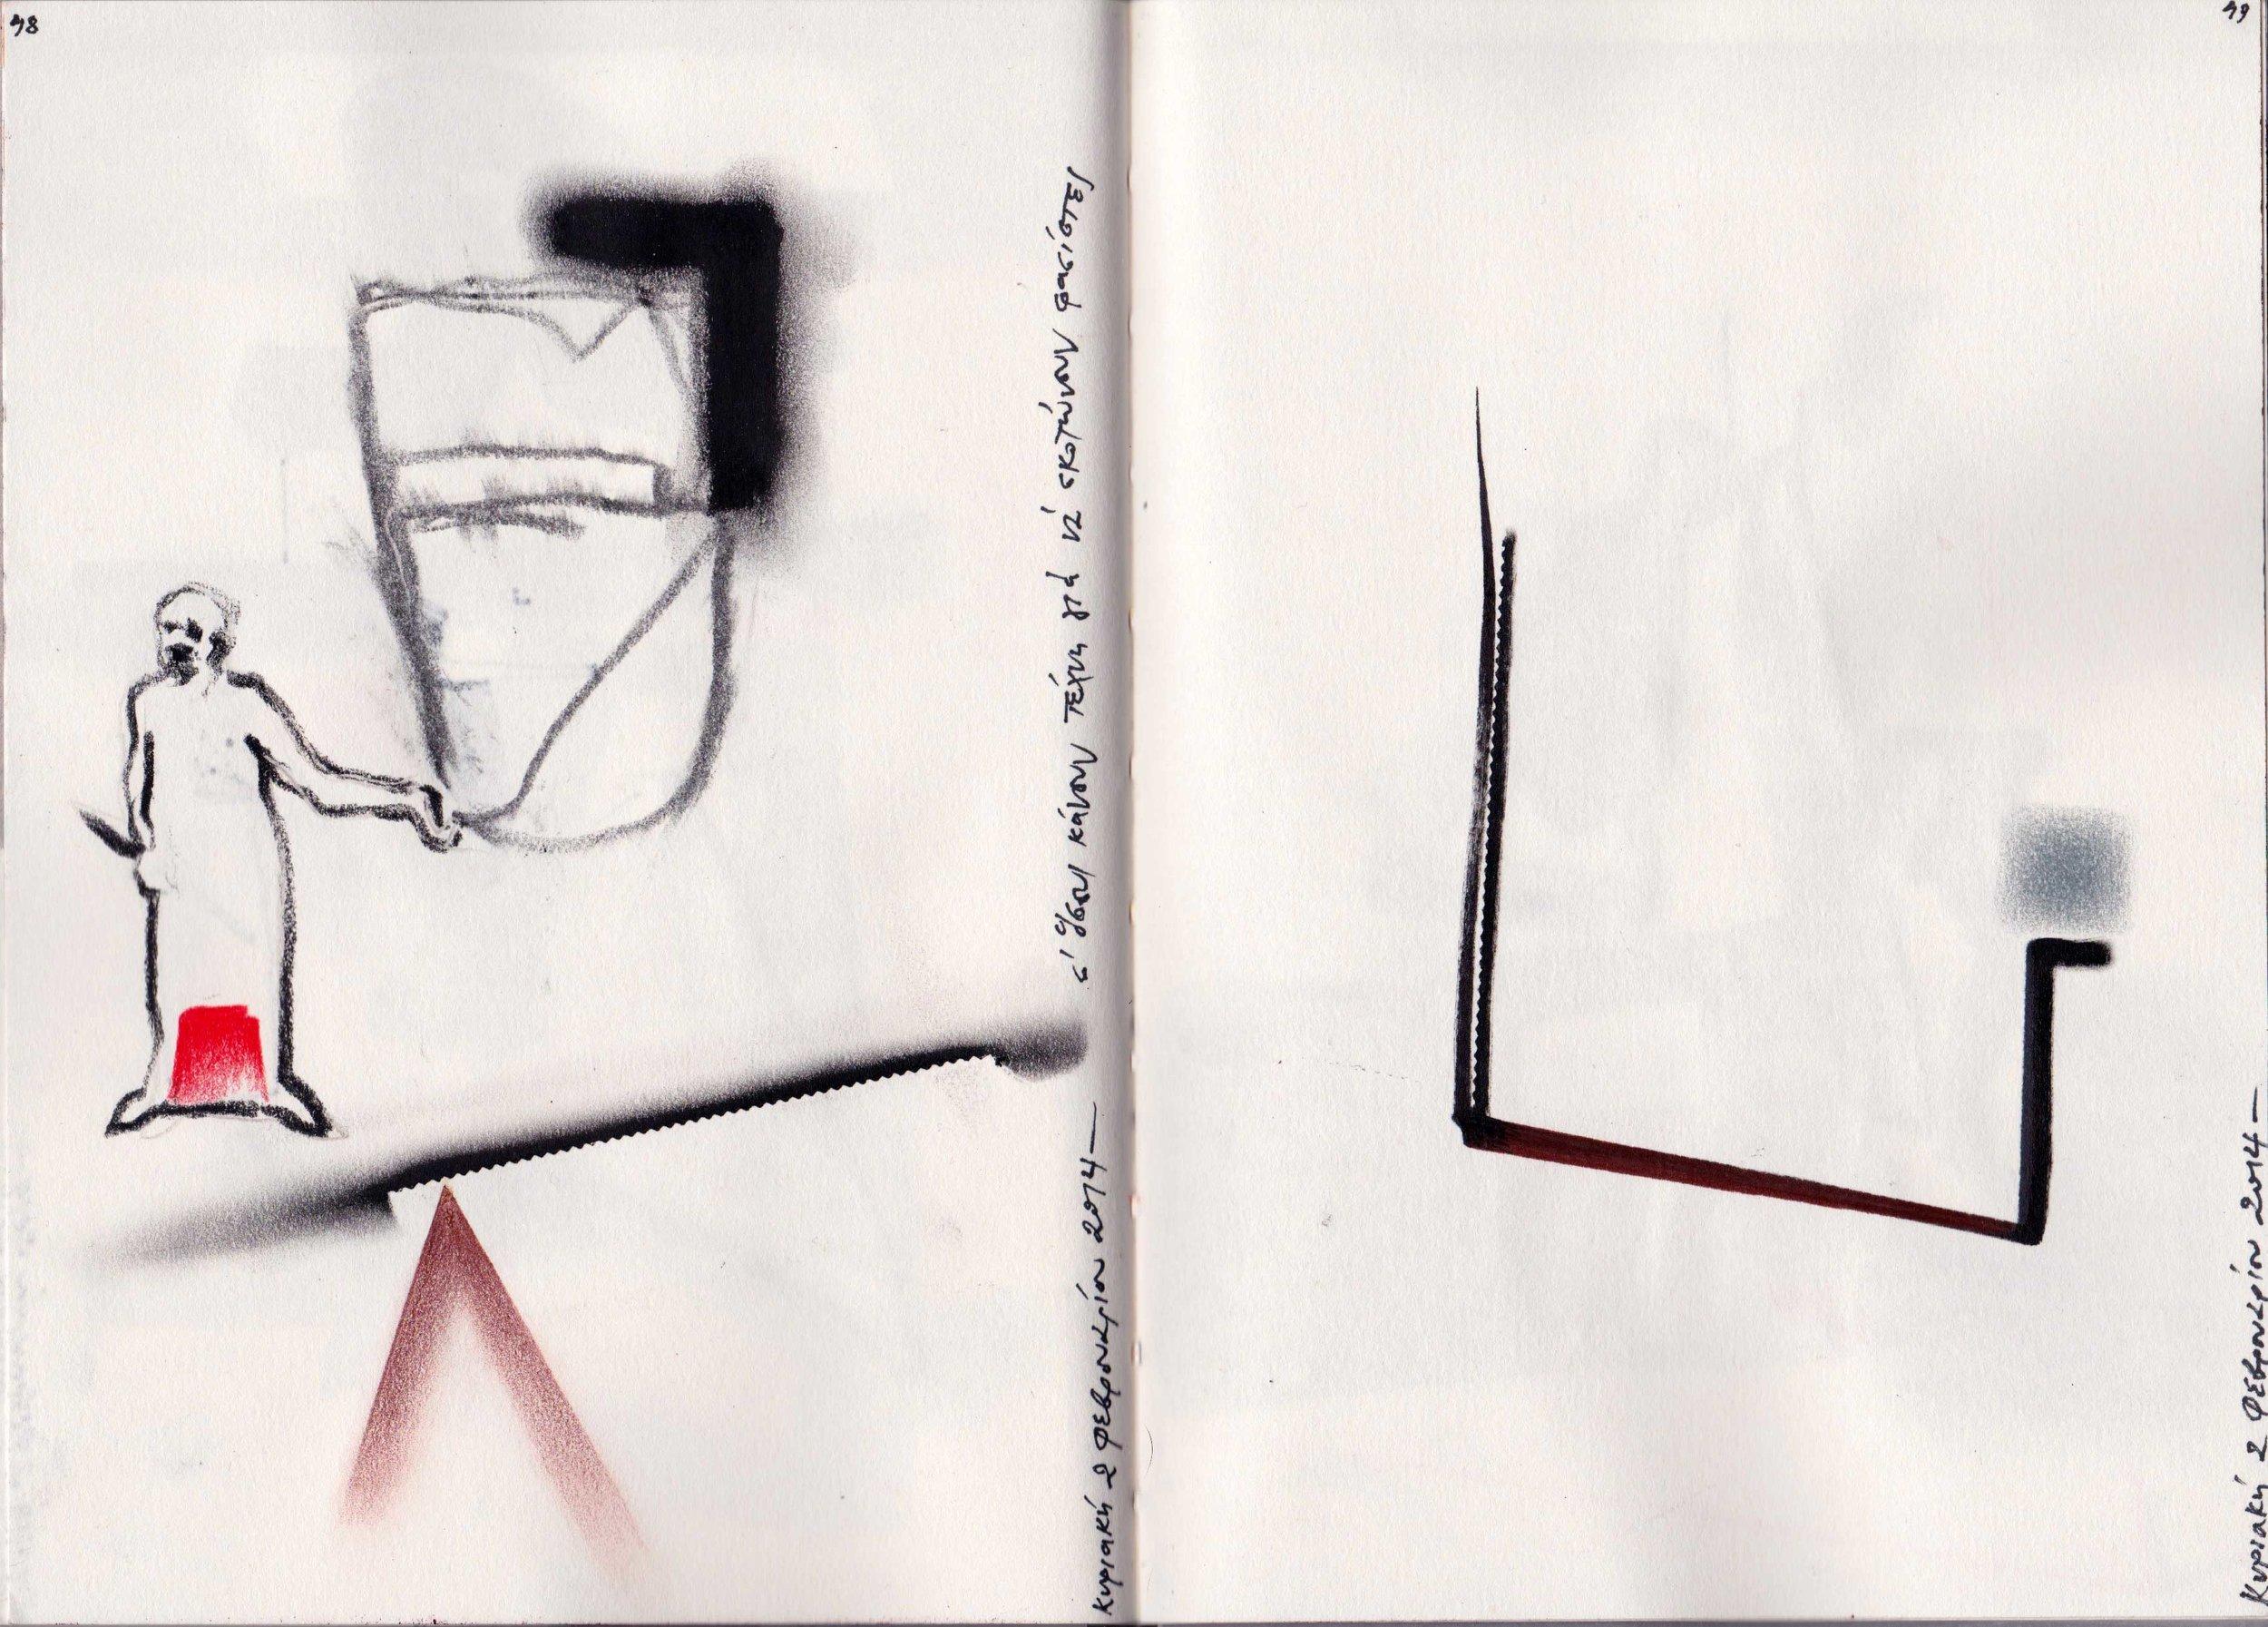 diary 16 page 48-49